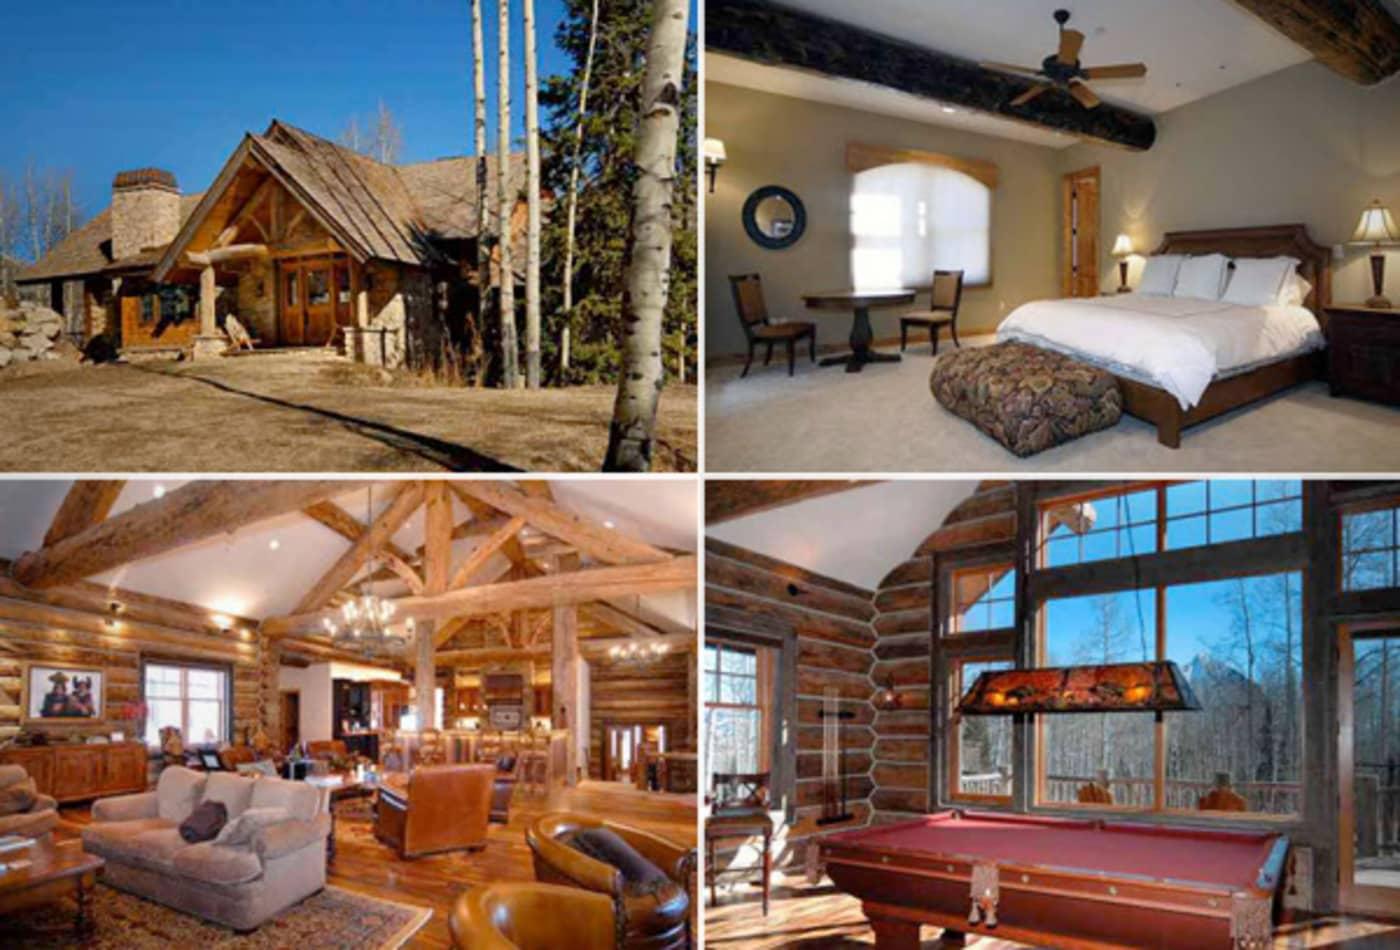 CNBC_luxurious_log_cabins_colorado.jpg